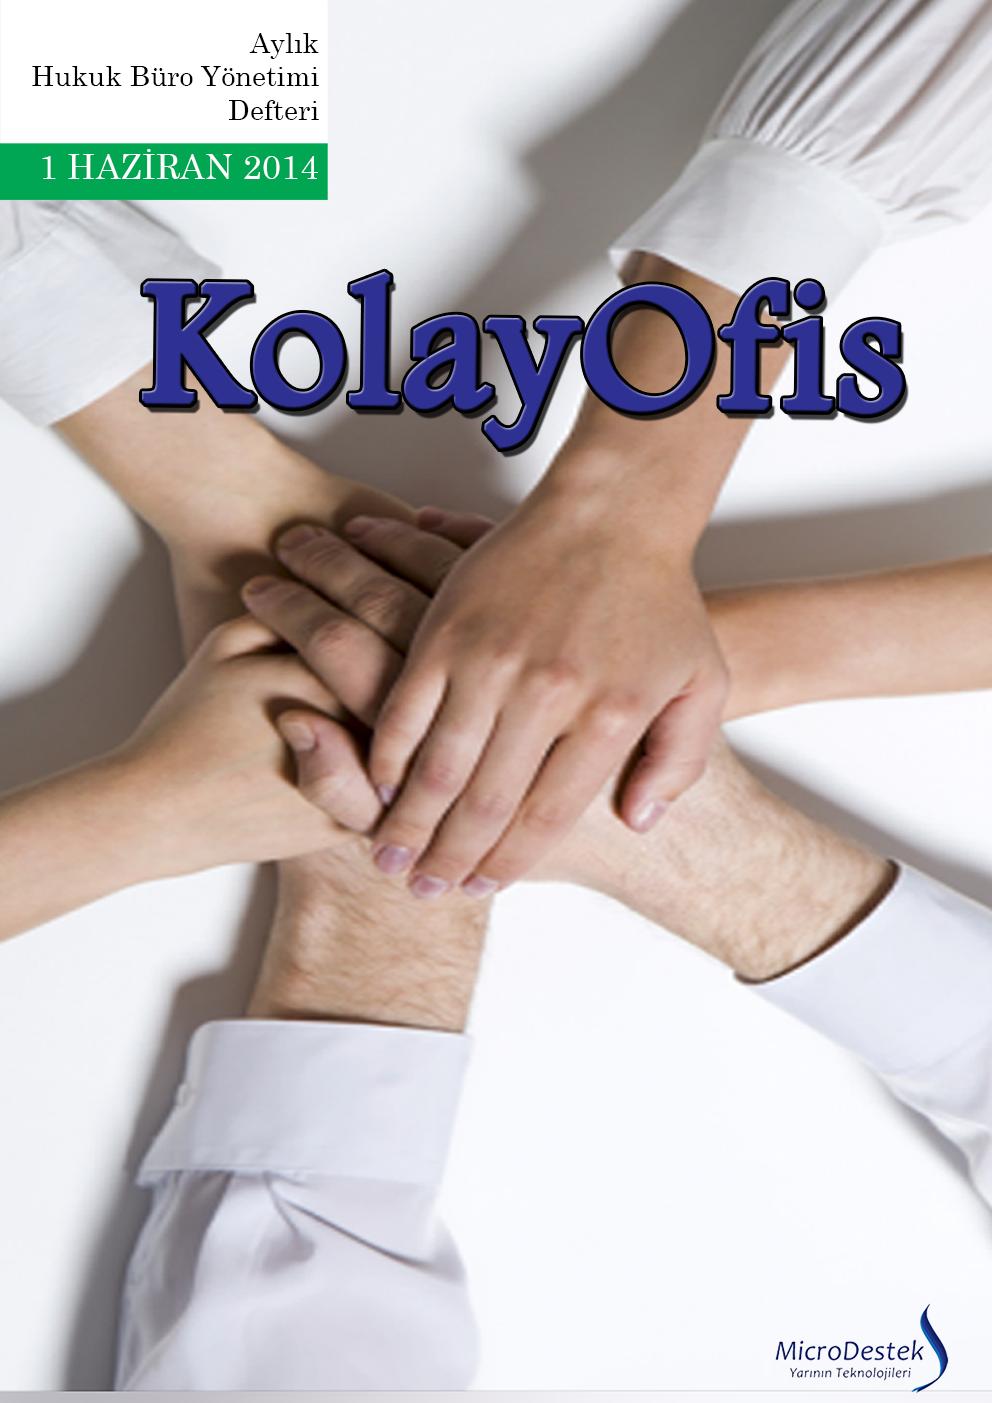 KolayOfis Hukuk Büro Yönetimi Dergisi Haziran 2014 Ana Kapak